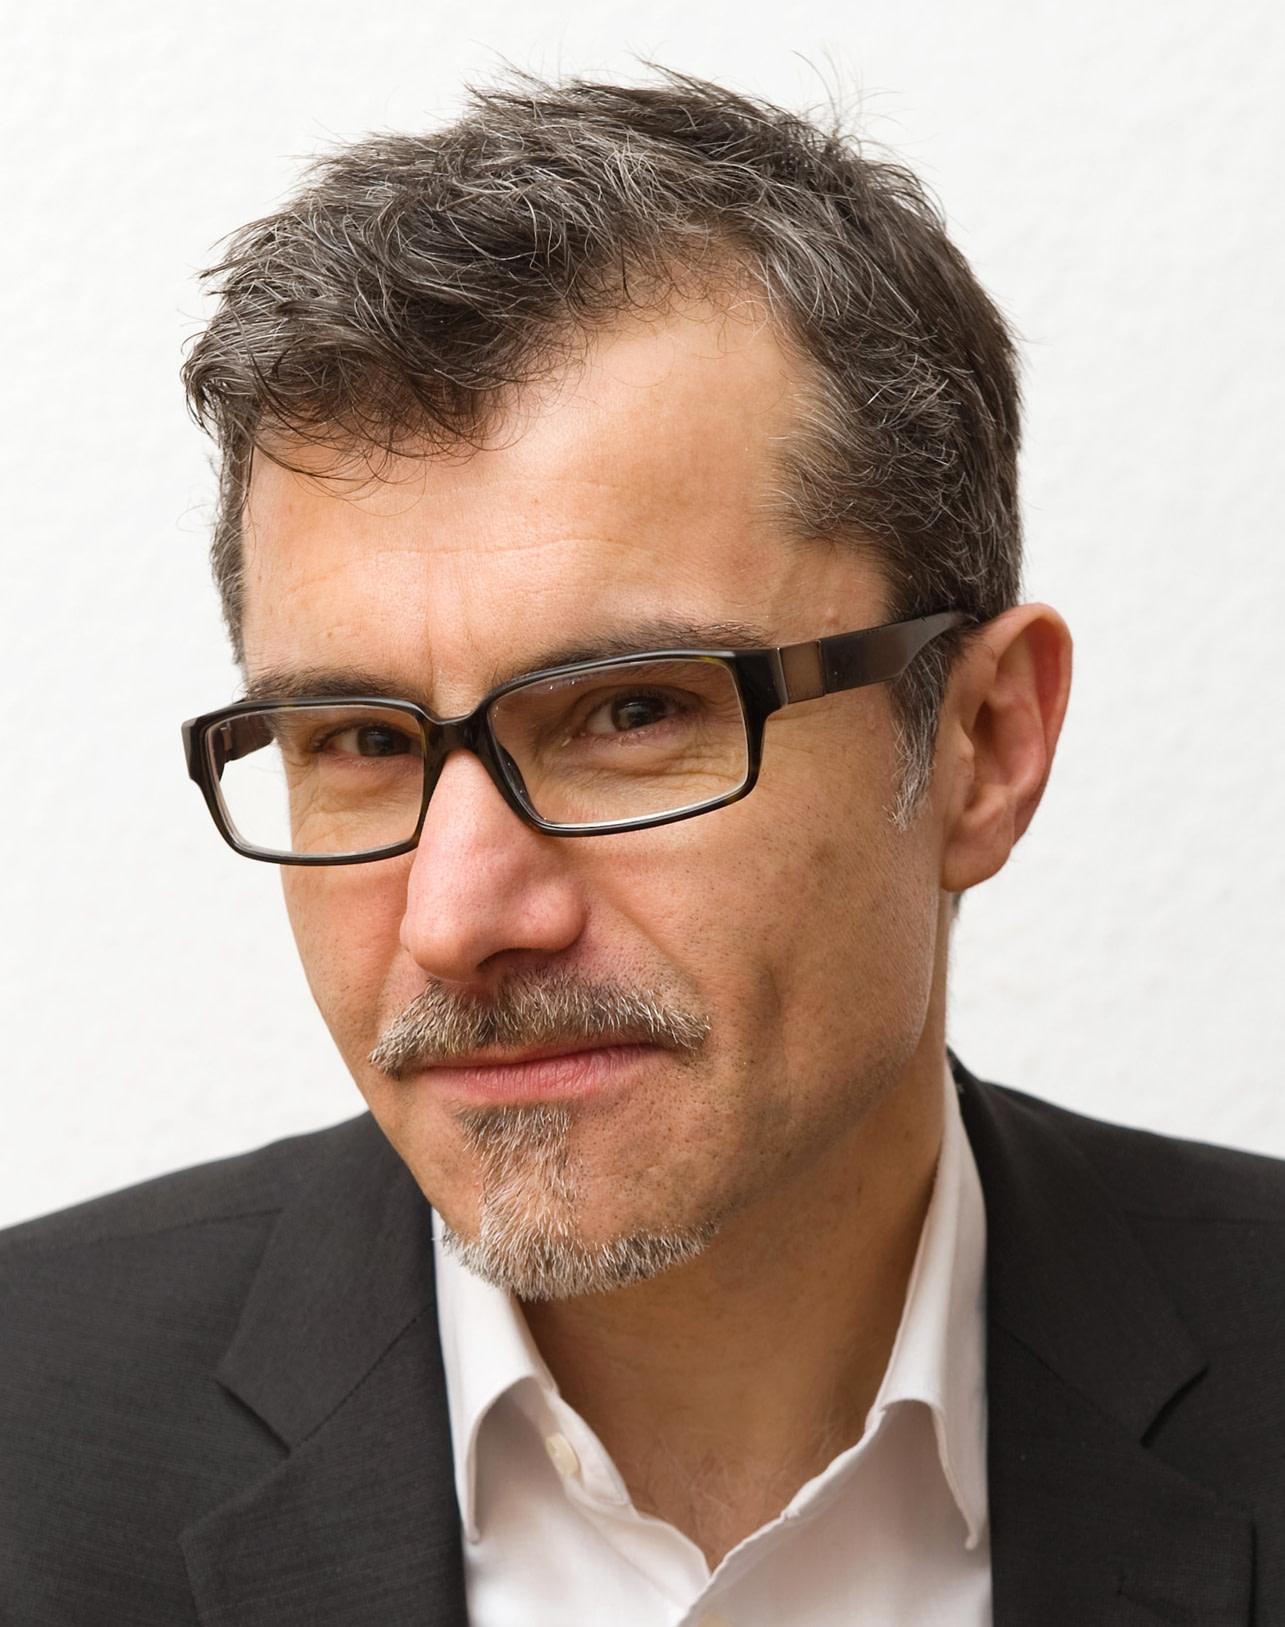 Dr. Ulrich Thielemann